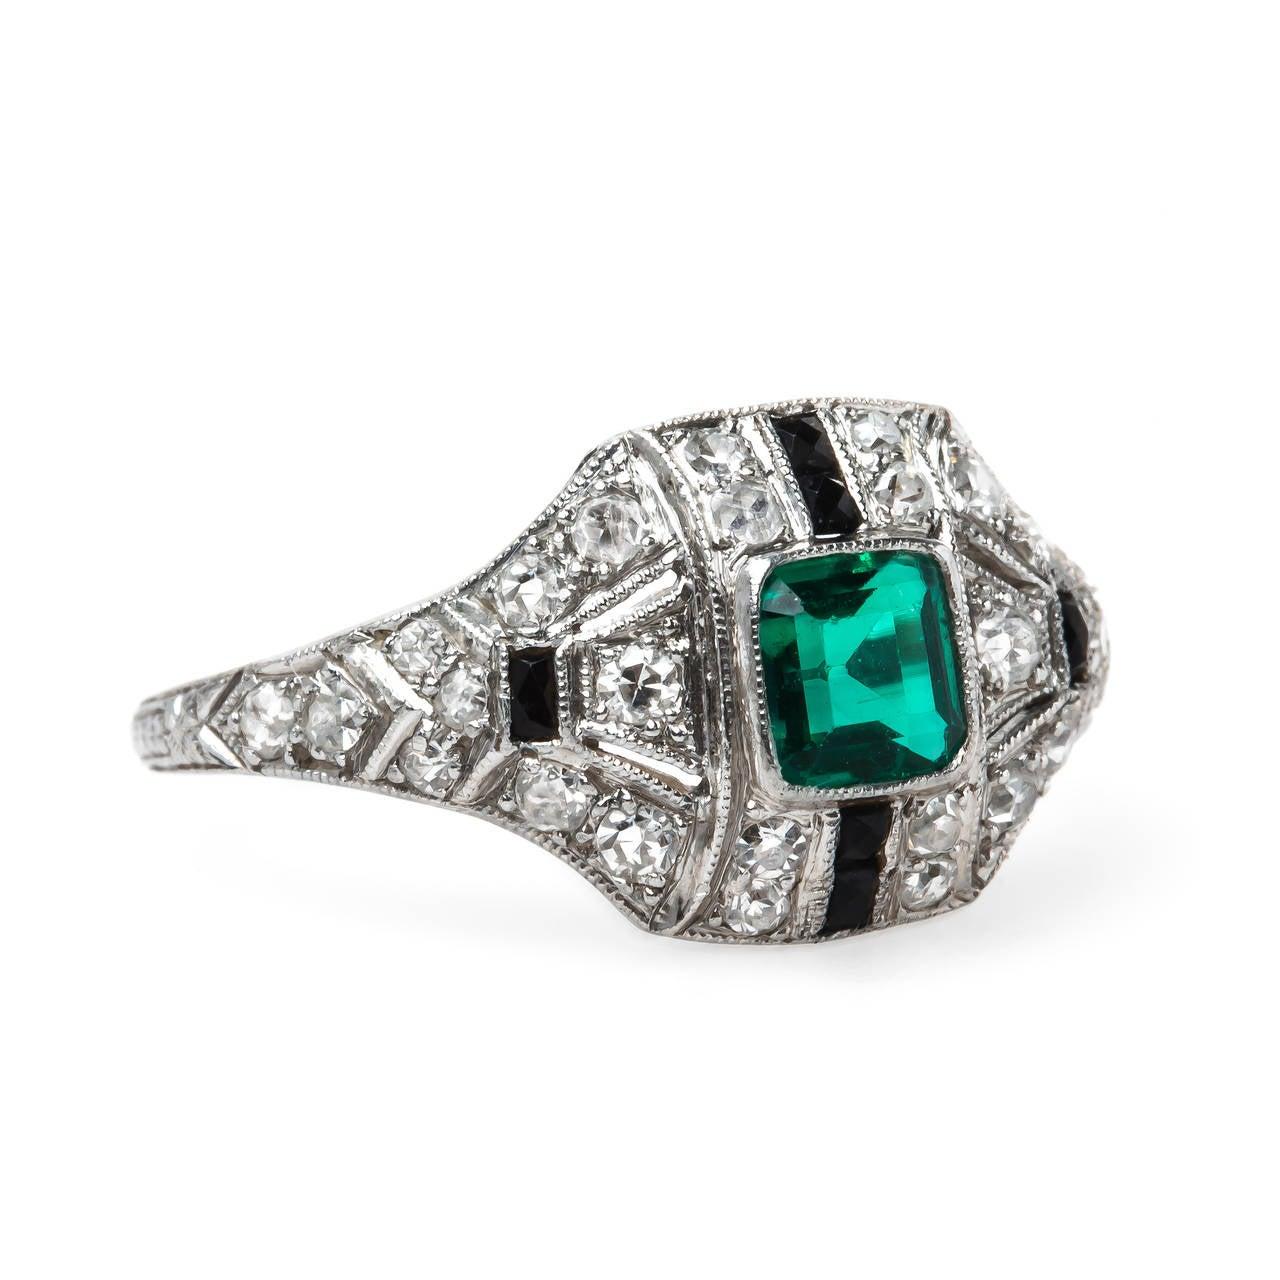 fantastically unique deco onyx emerald ring at